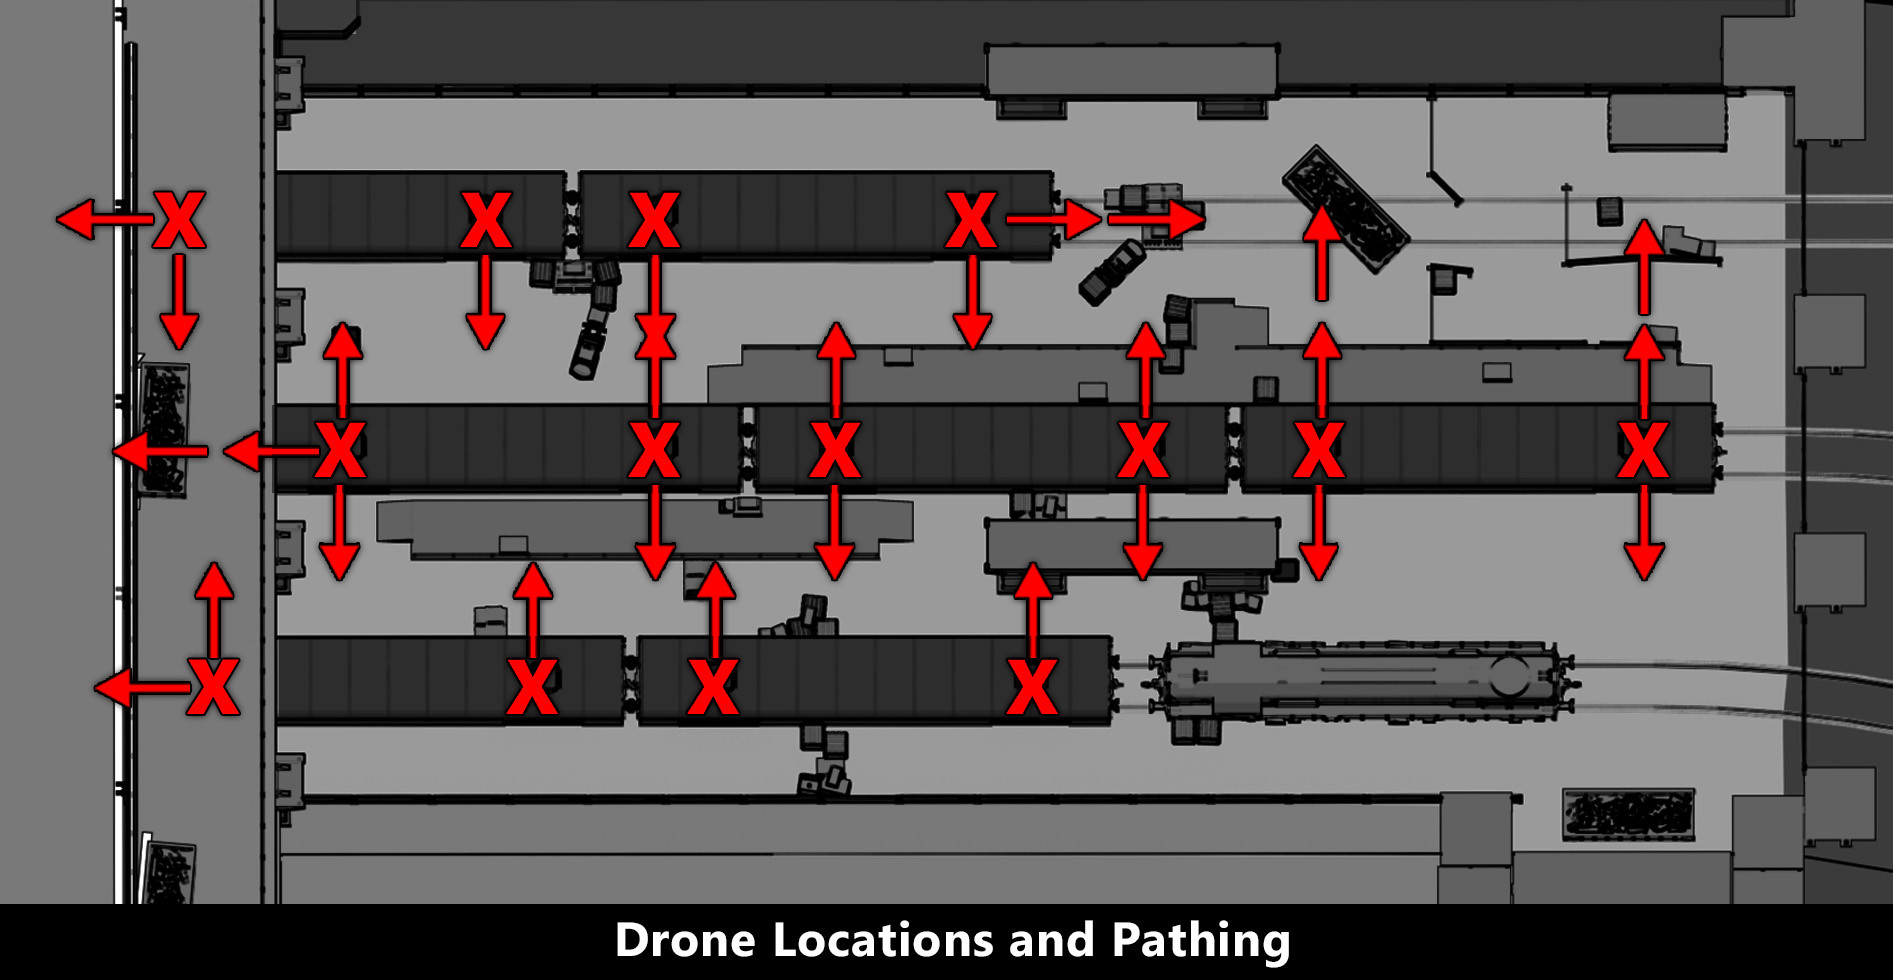 drone_layout.jpg.7150d2dffcdc3a20cae2d3abbadca803.jpg